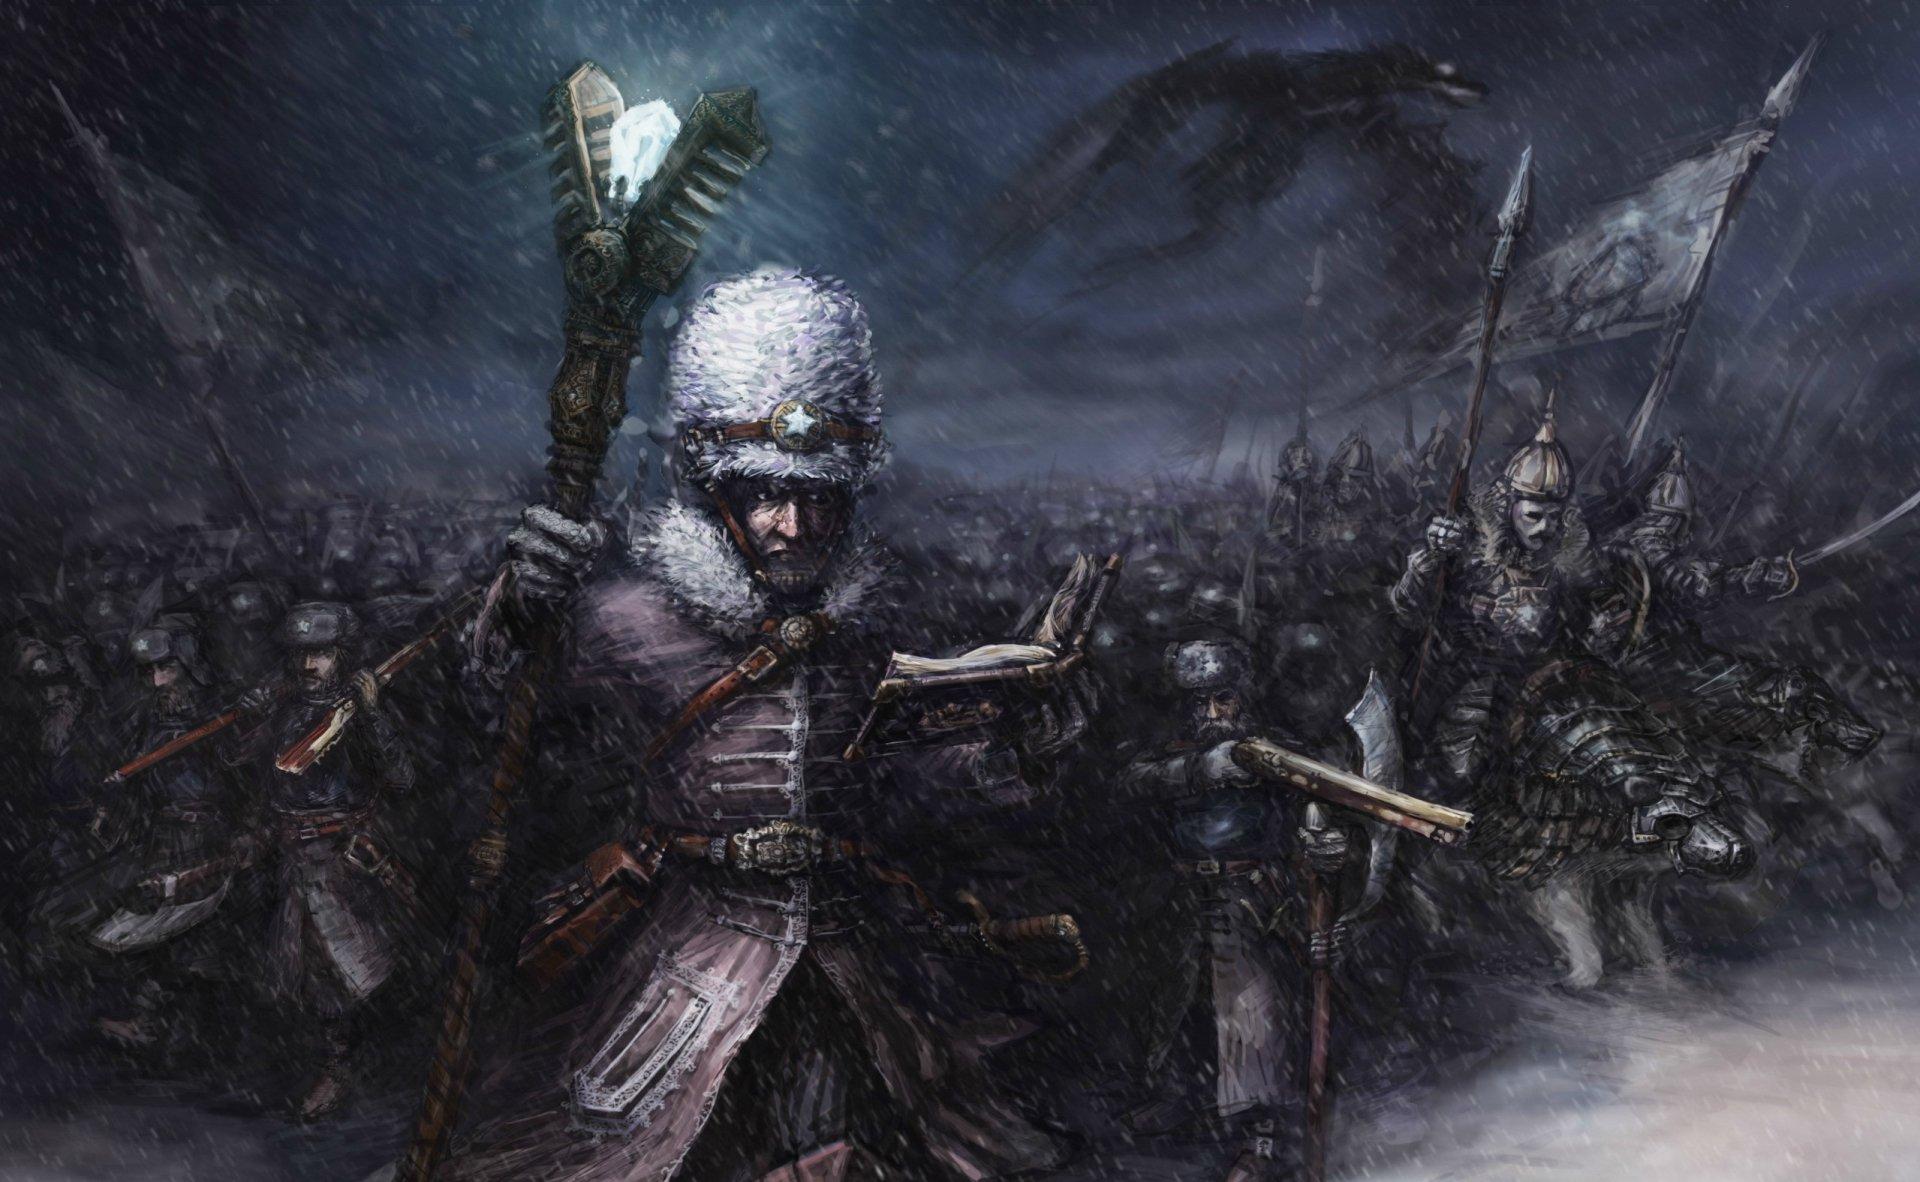 Fantasía - Batalla  Fondo de Pantalla